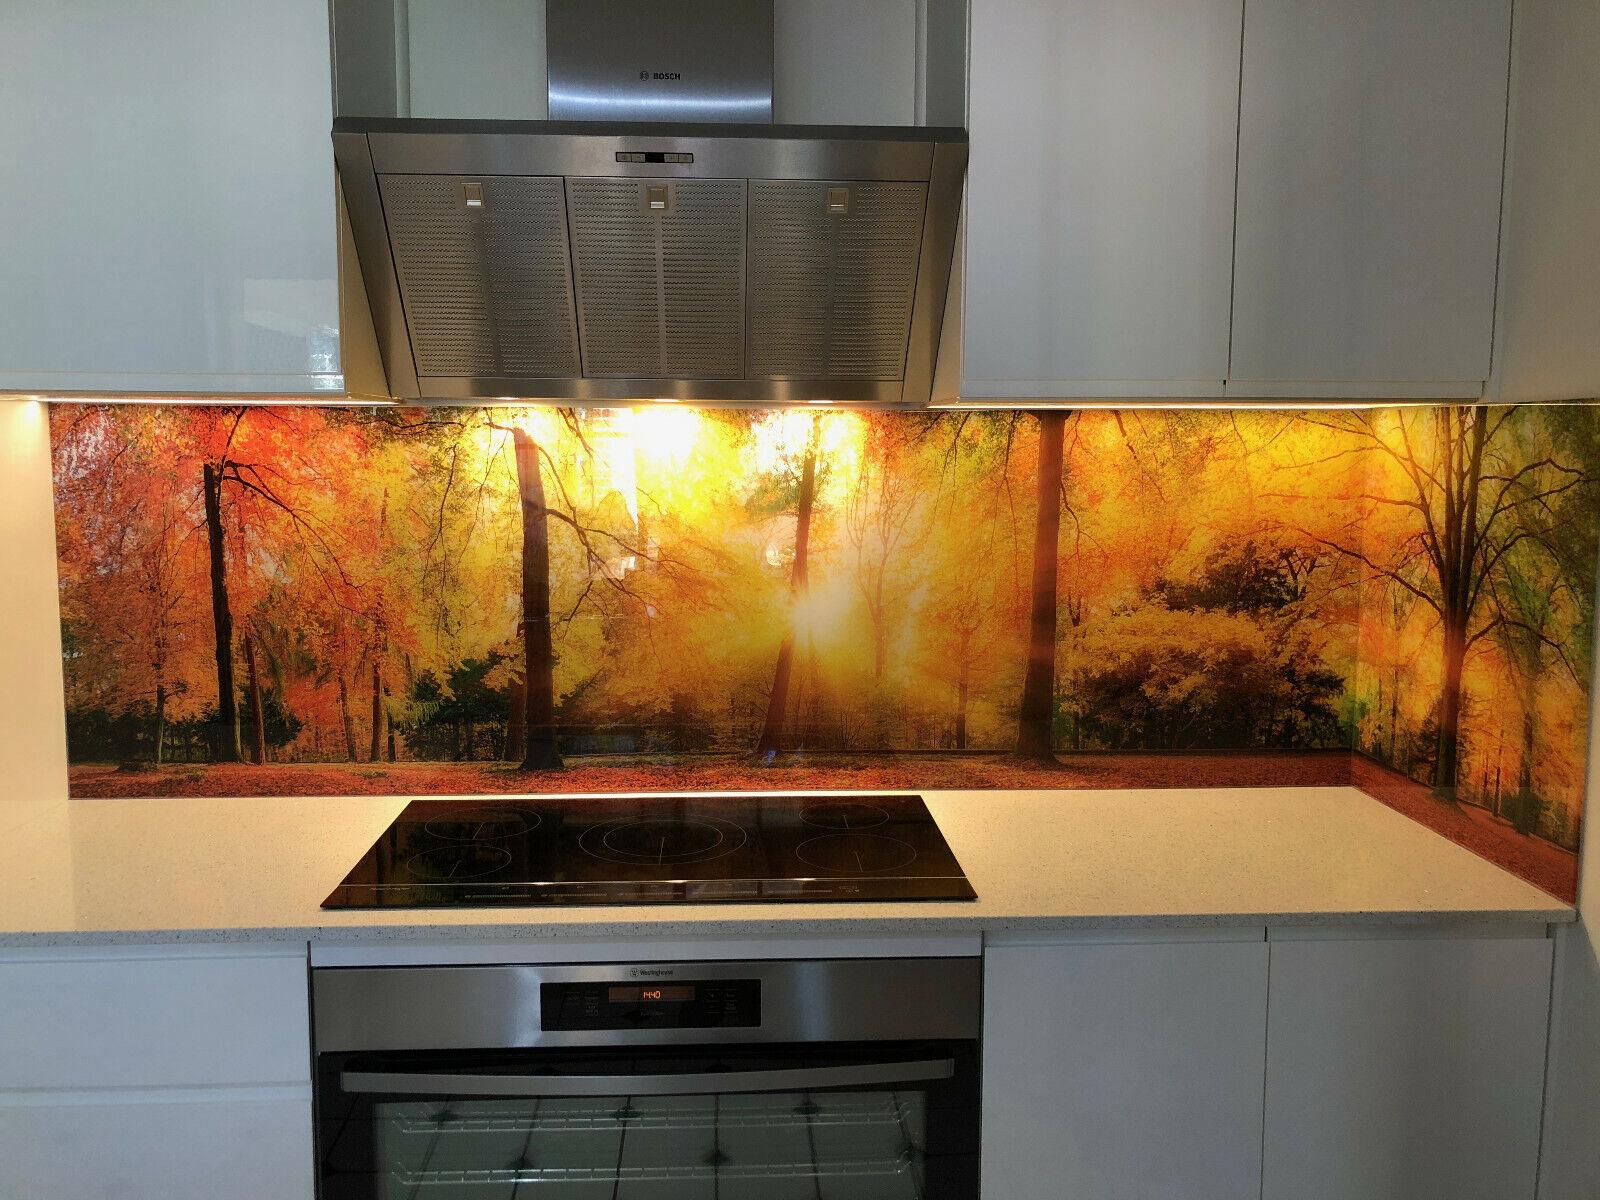 - Printed Acrylic Splashbacks Any High Res Image /graphic /pattern